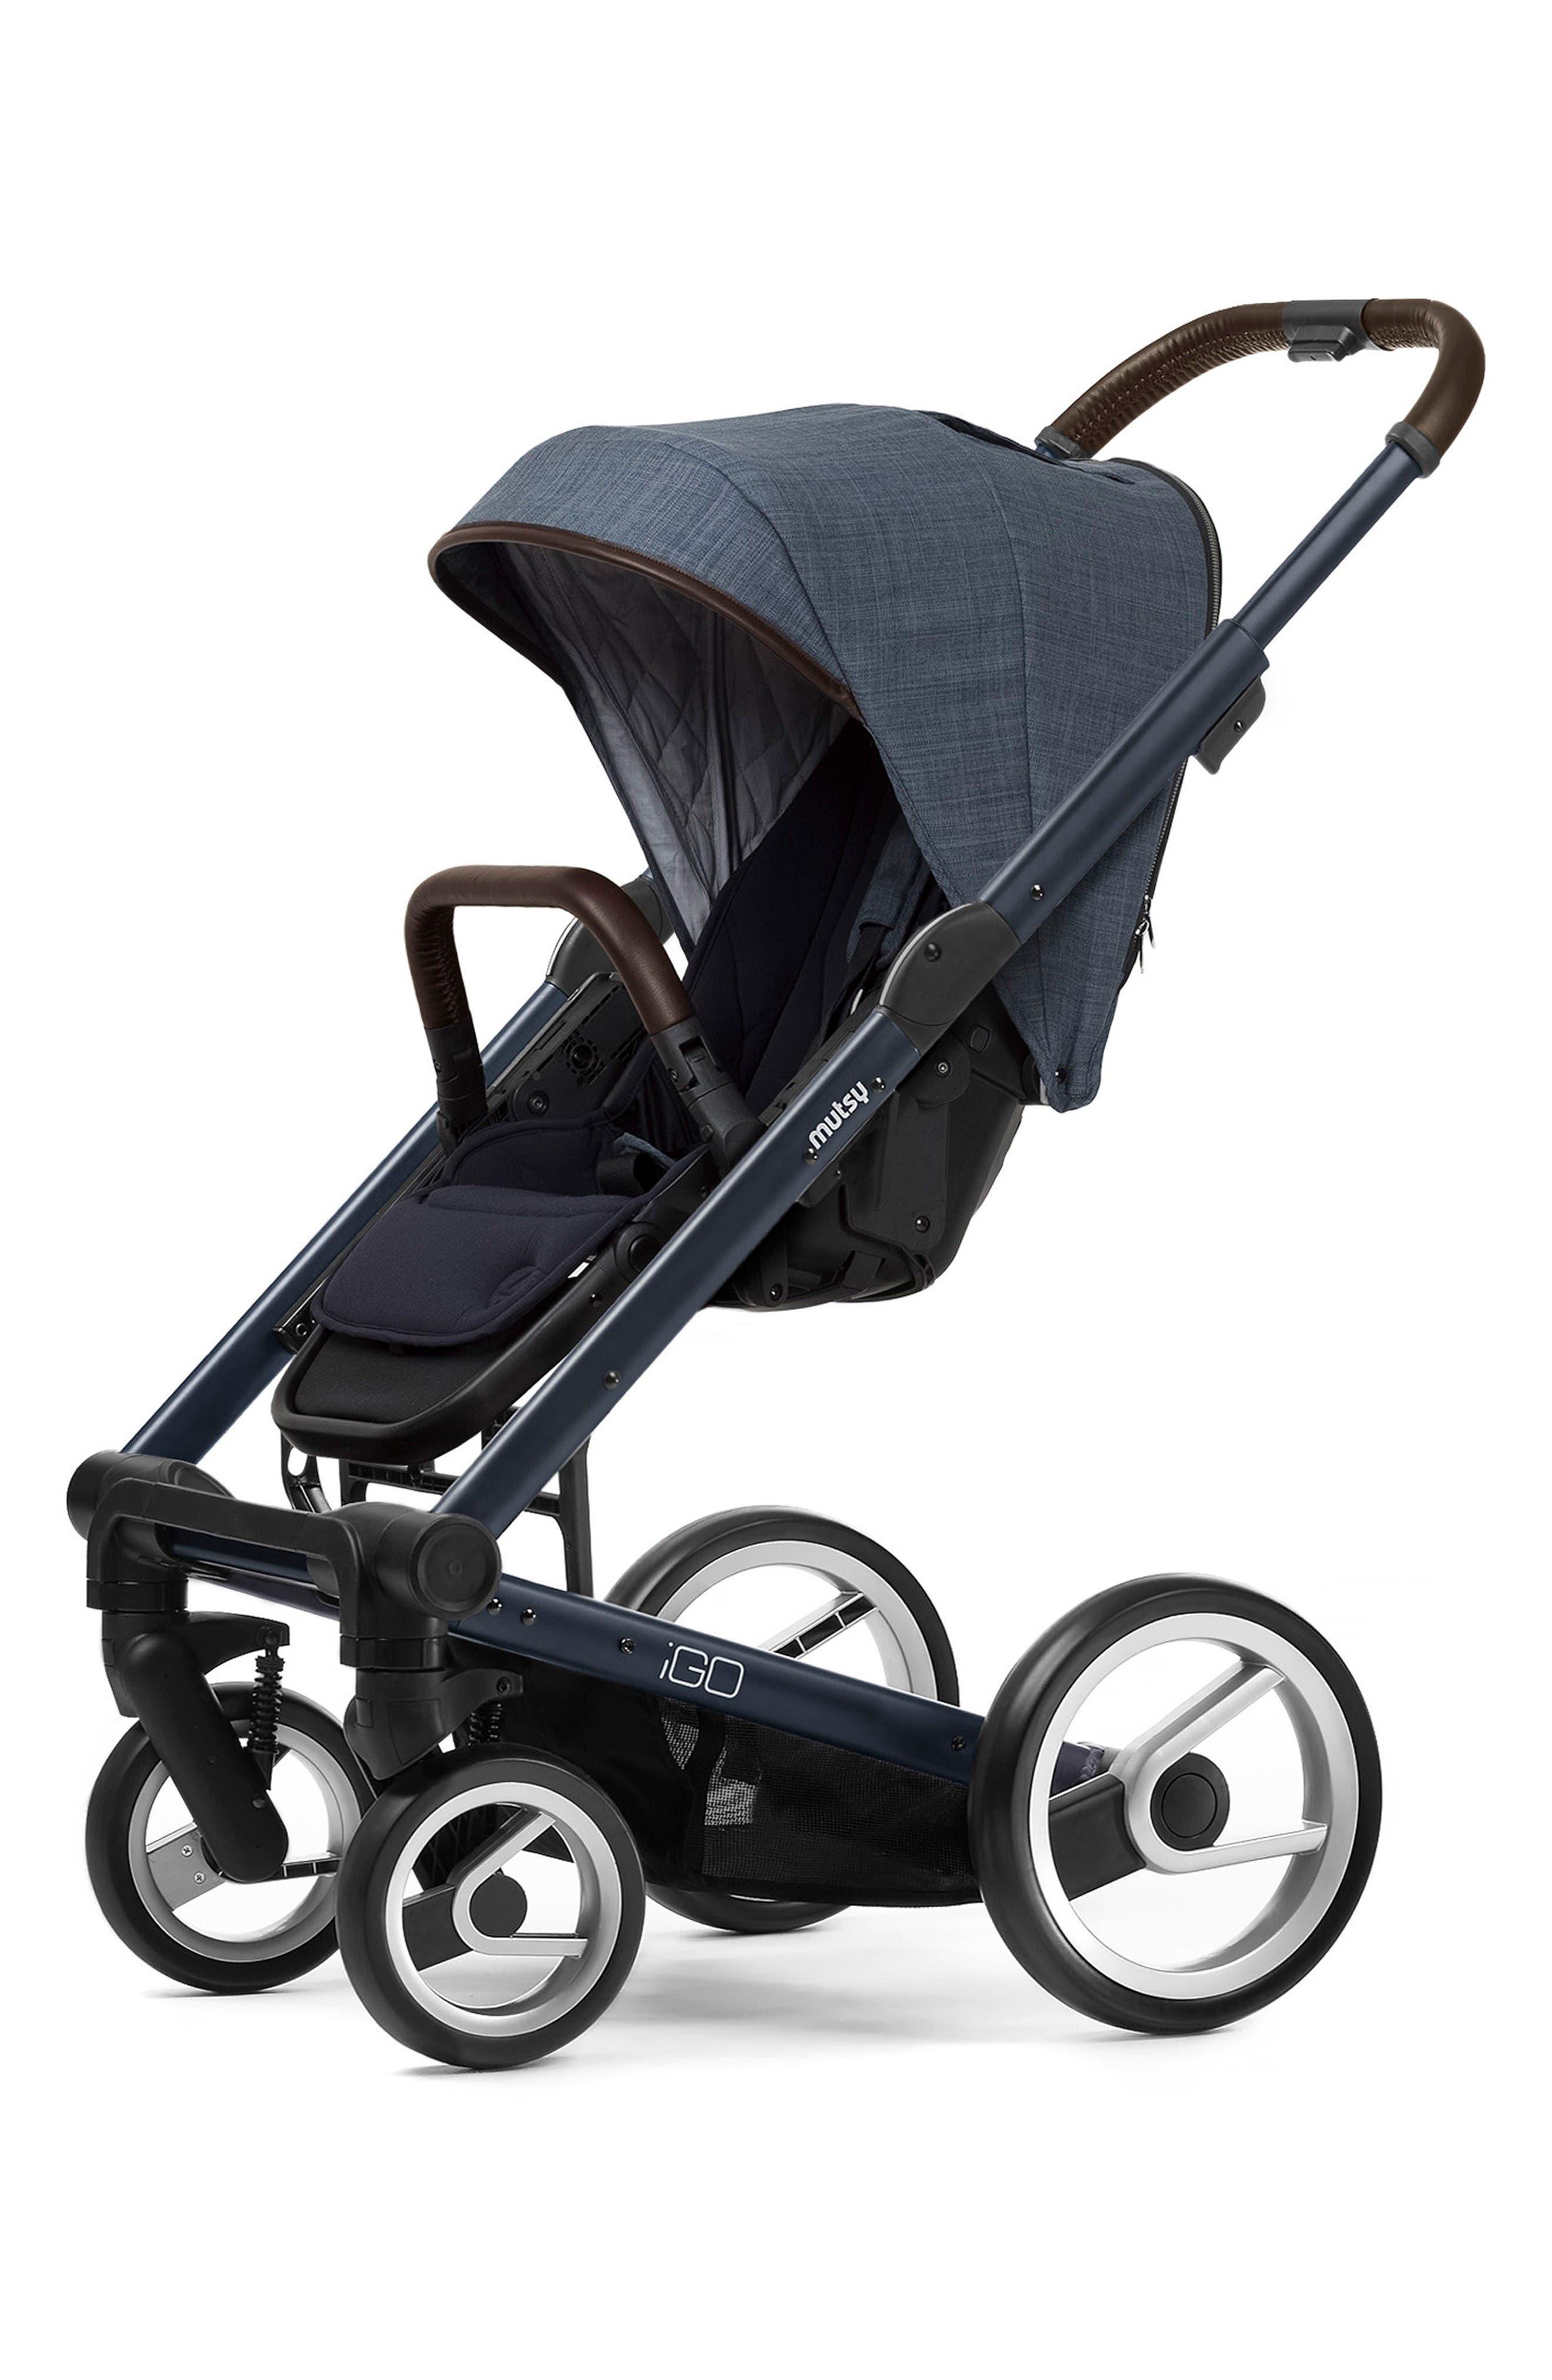 Alternate Image 1 Selected - Mutsy Igo - Farmer Earth Stroller